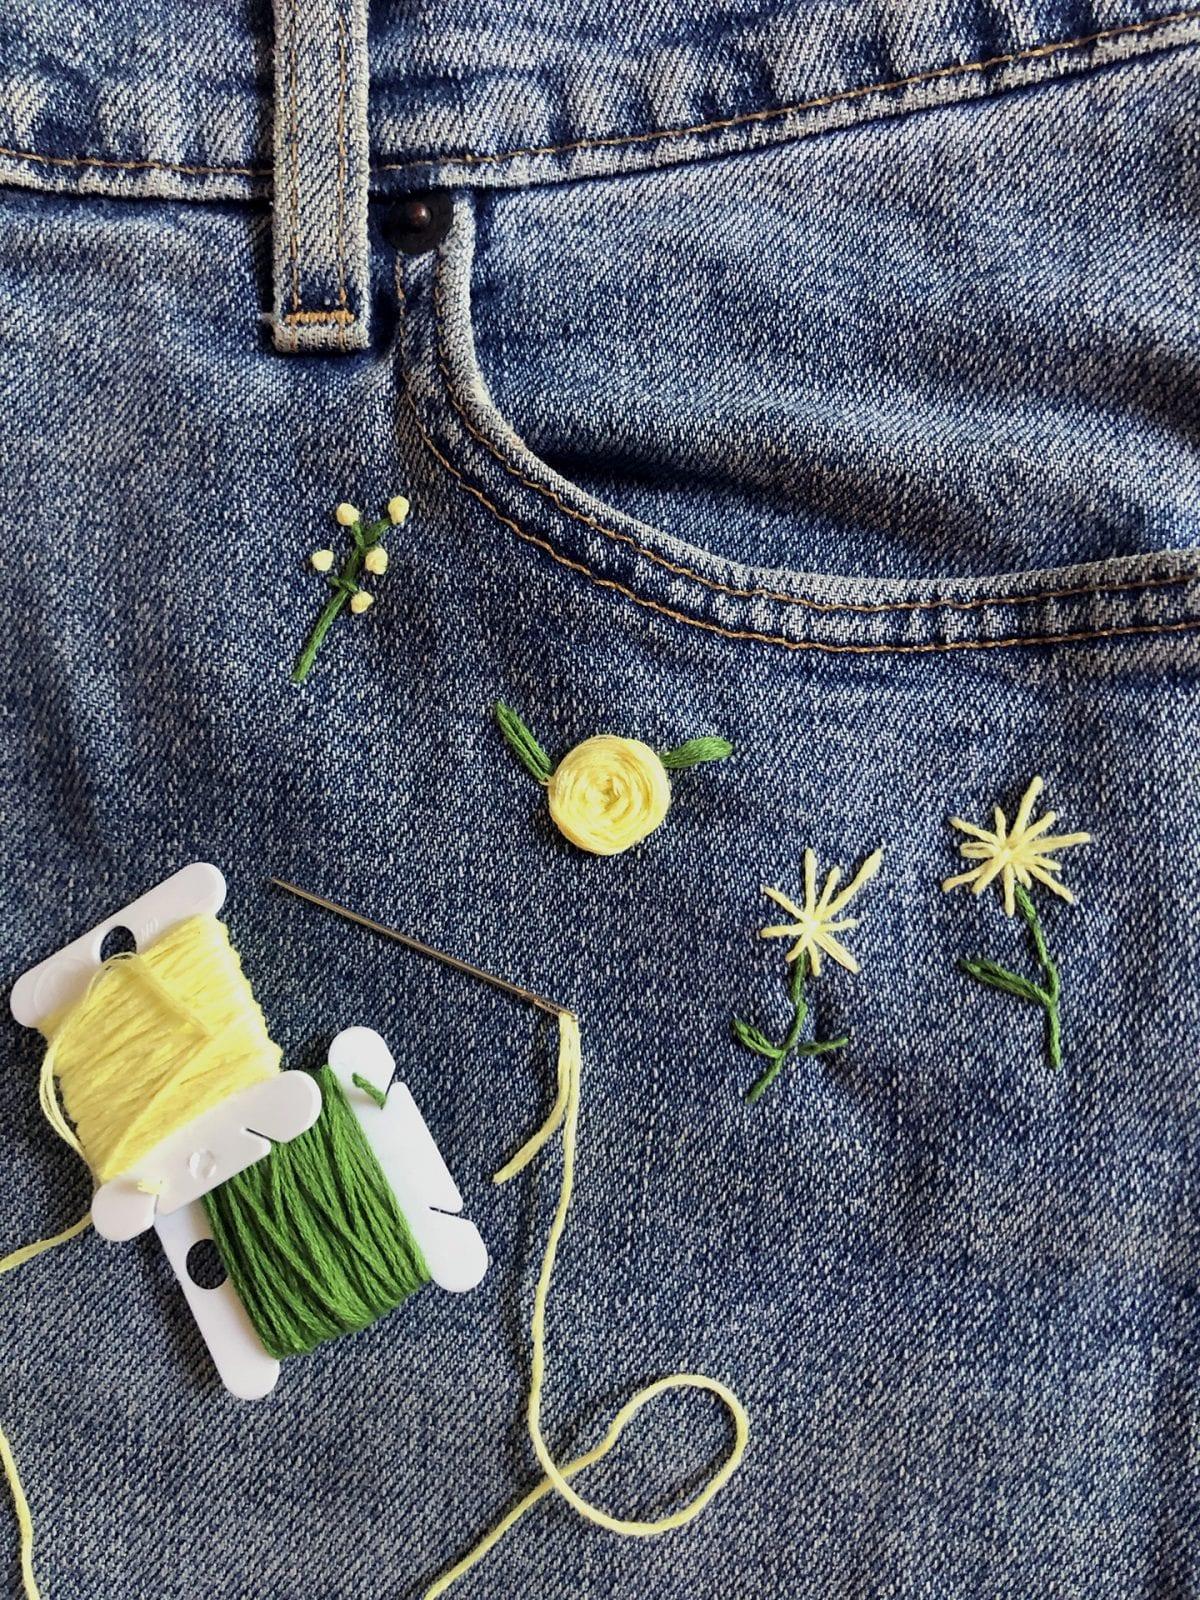 Darcy Miller Designs, Camp Darcy, Flowers